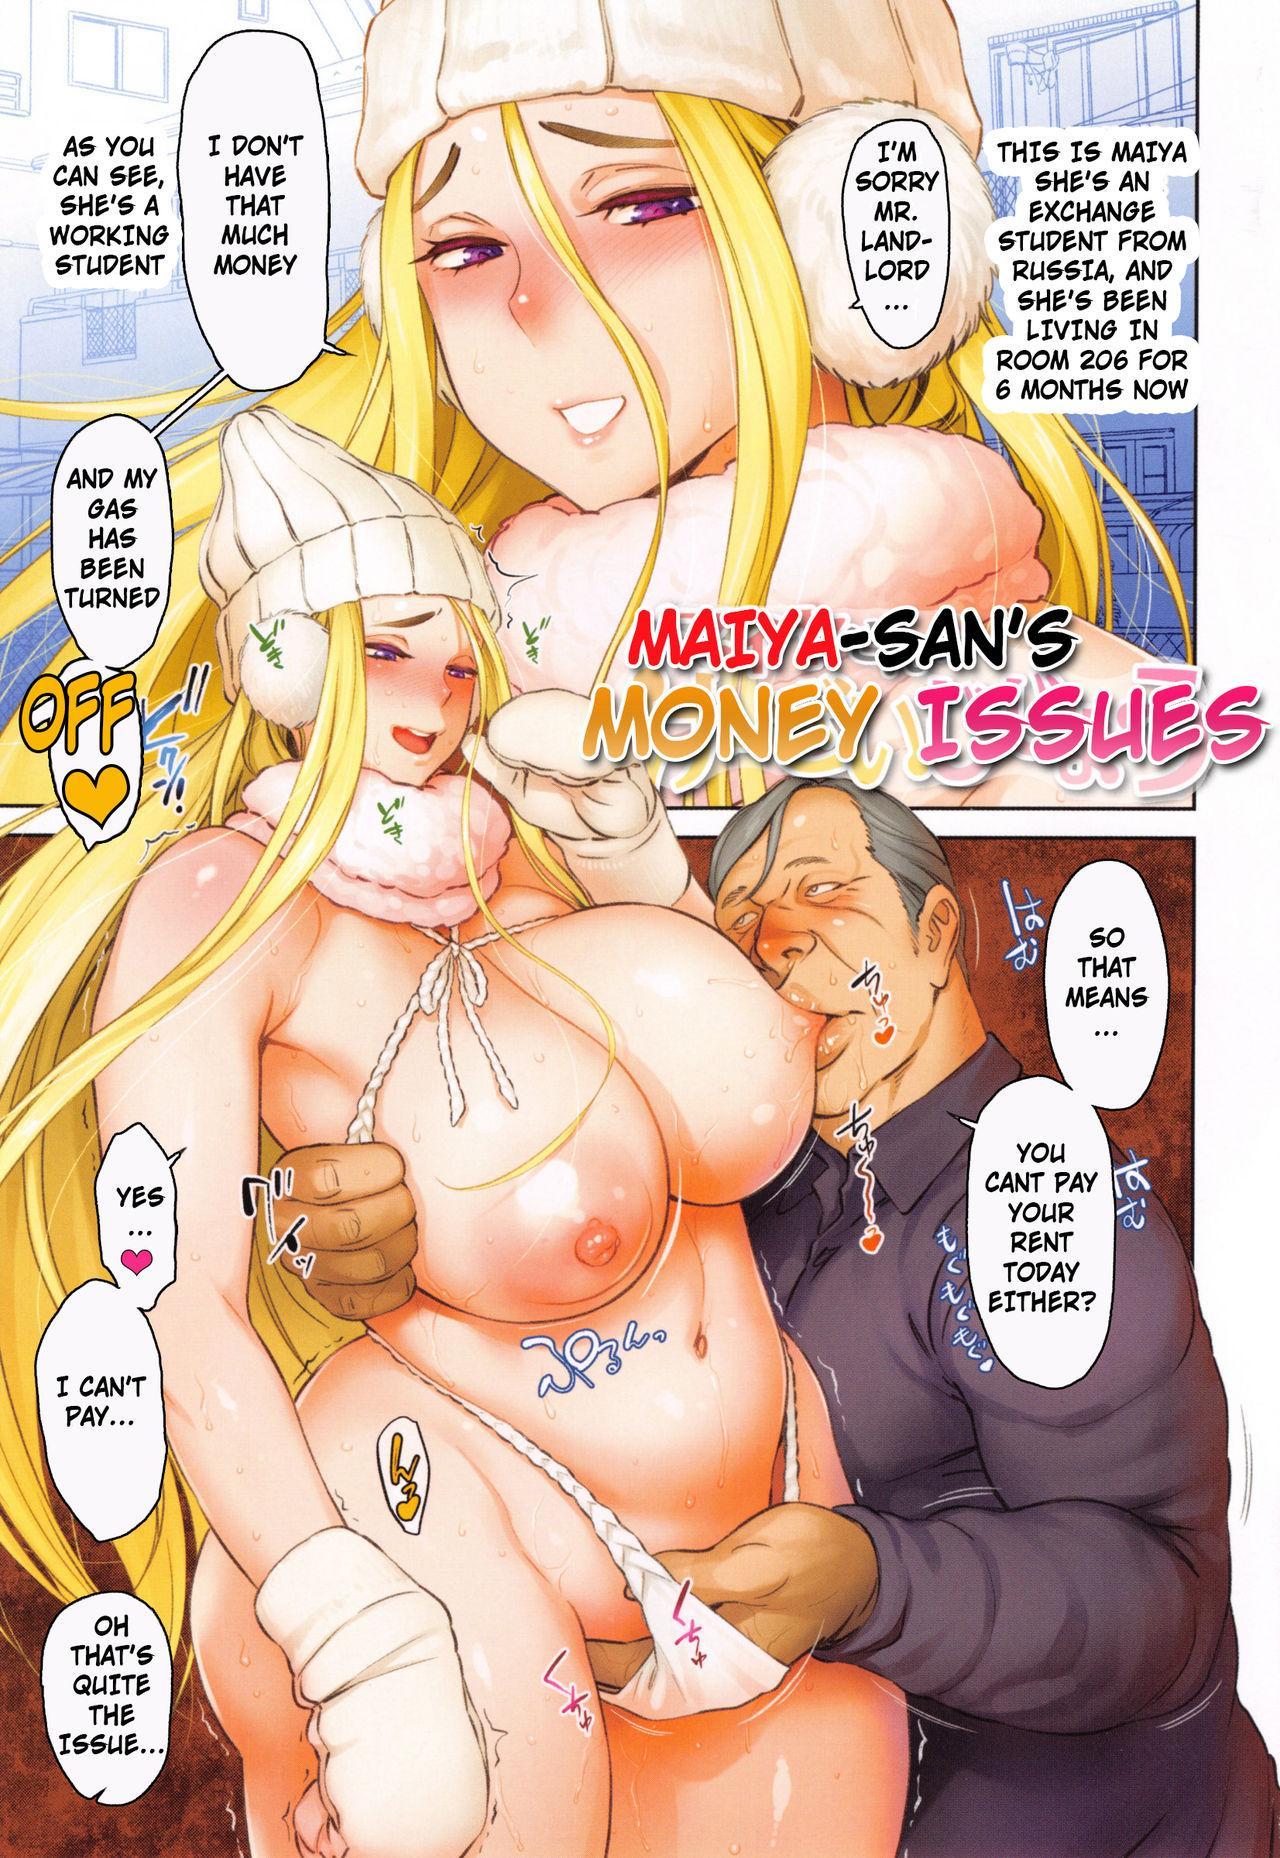 [Bobobo] Maiya-san no Keizai Jijou | Maiya-san's Money Issues (FRESH FLESH) [English] [PHILO] 1